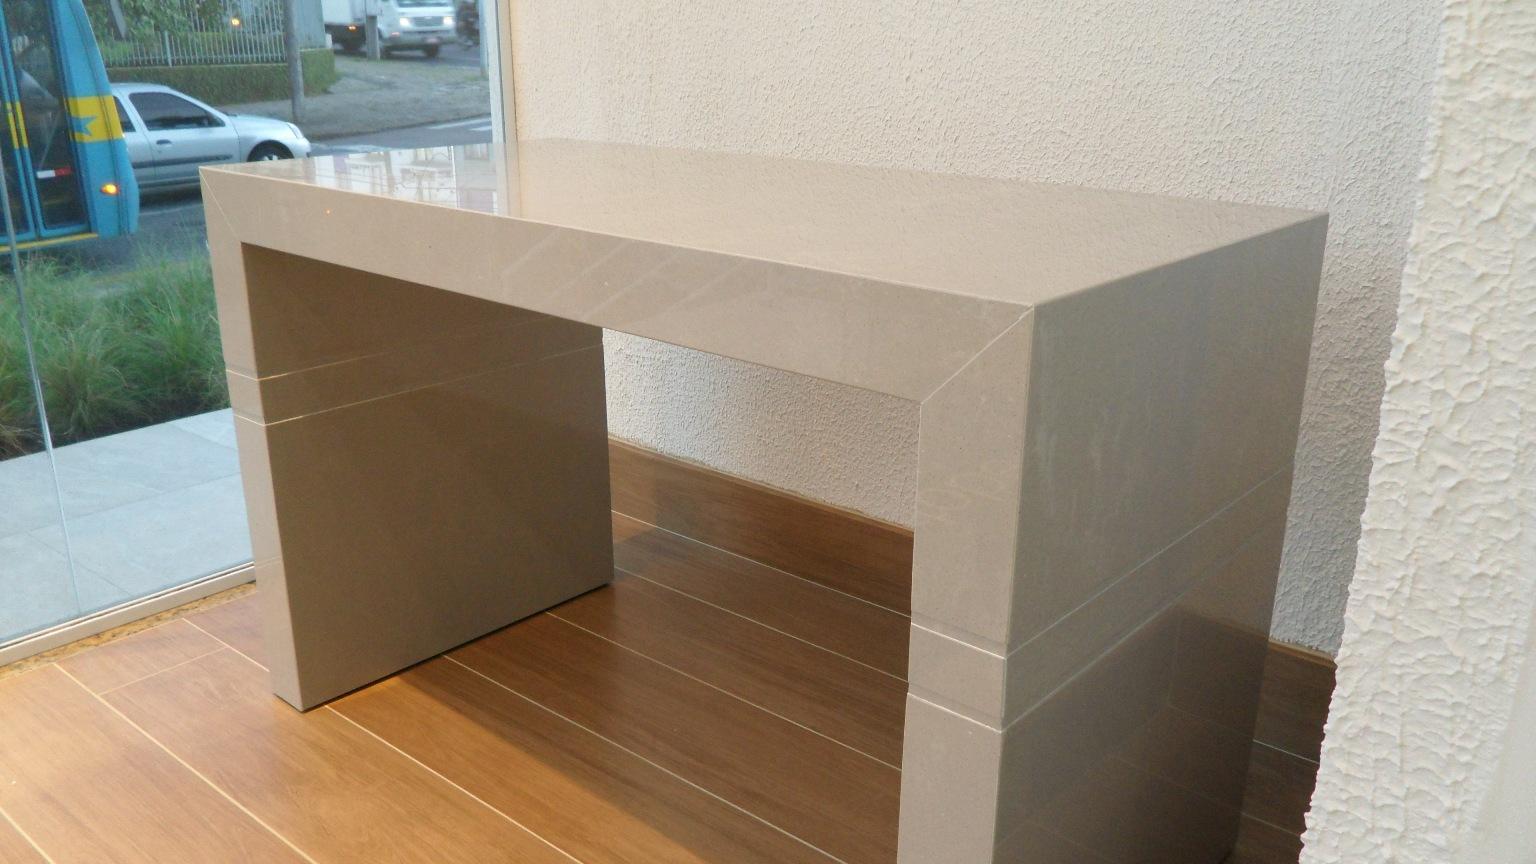 50 marcadores mesa revestida com porcelanato portobello corte 45 graus #946637 1536x864